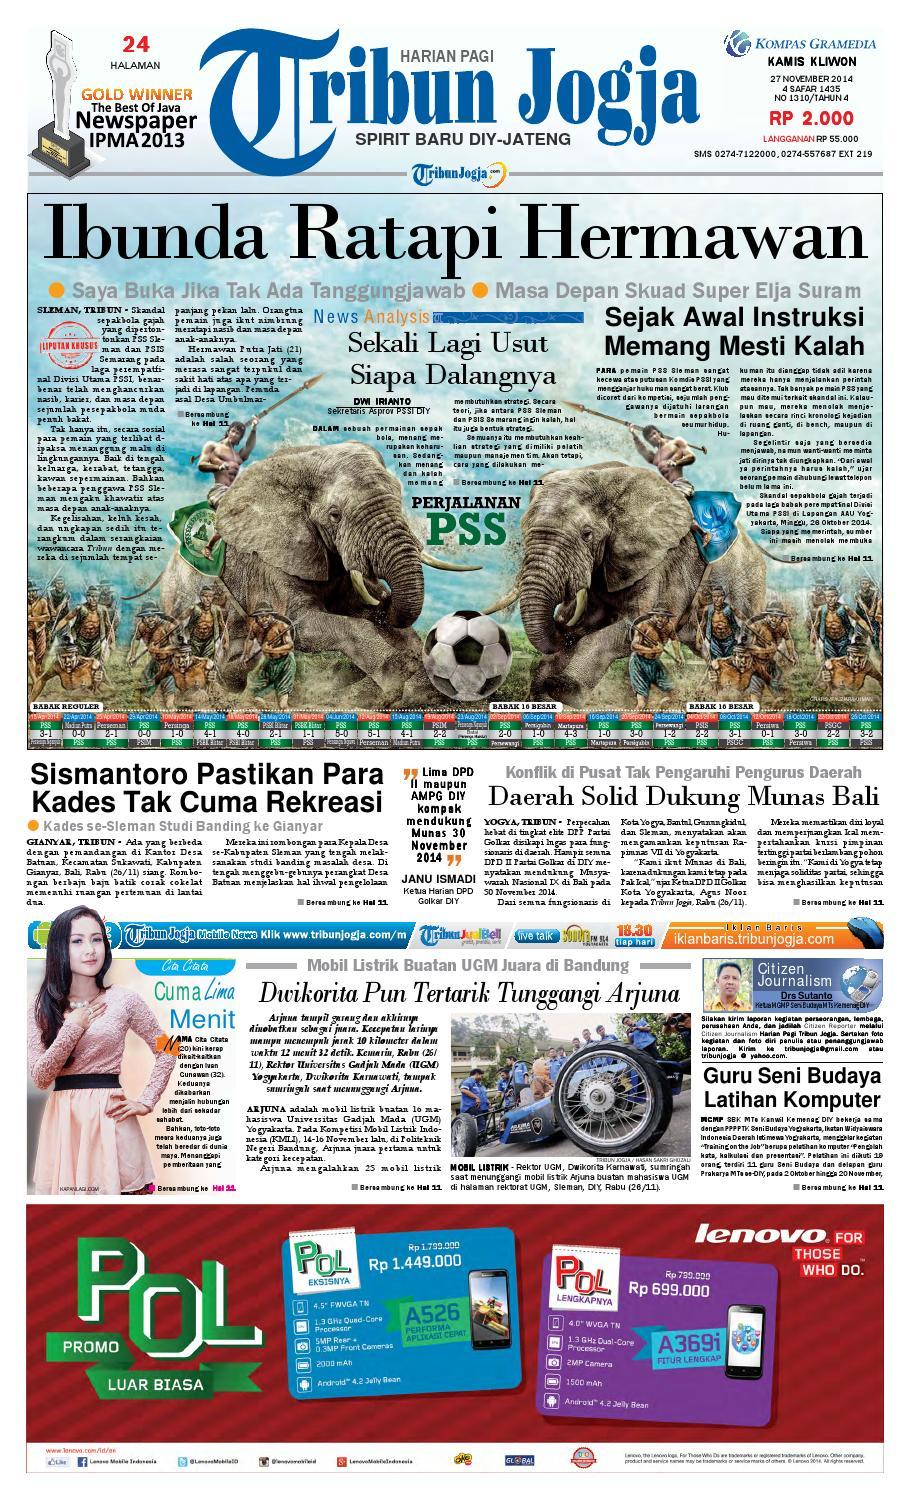 Tribunjogja 28 01 2015 By Tribun Jogja Issuu Produk Ukm Bumn Dat Edwina Bali Orange Slip On 27 11 2014